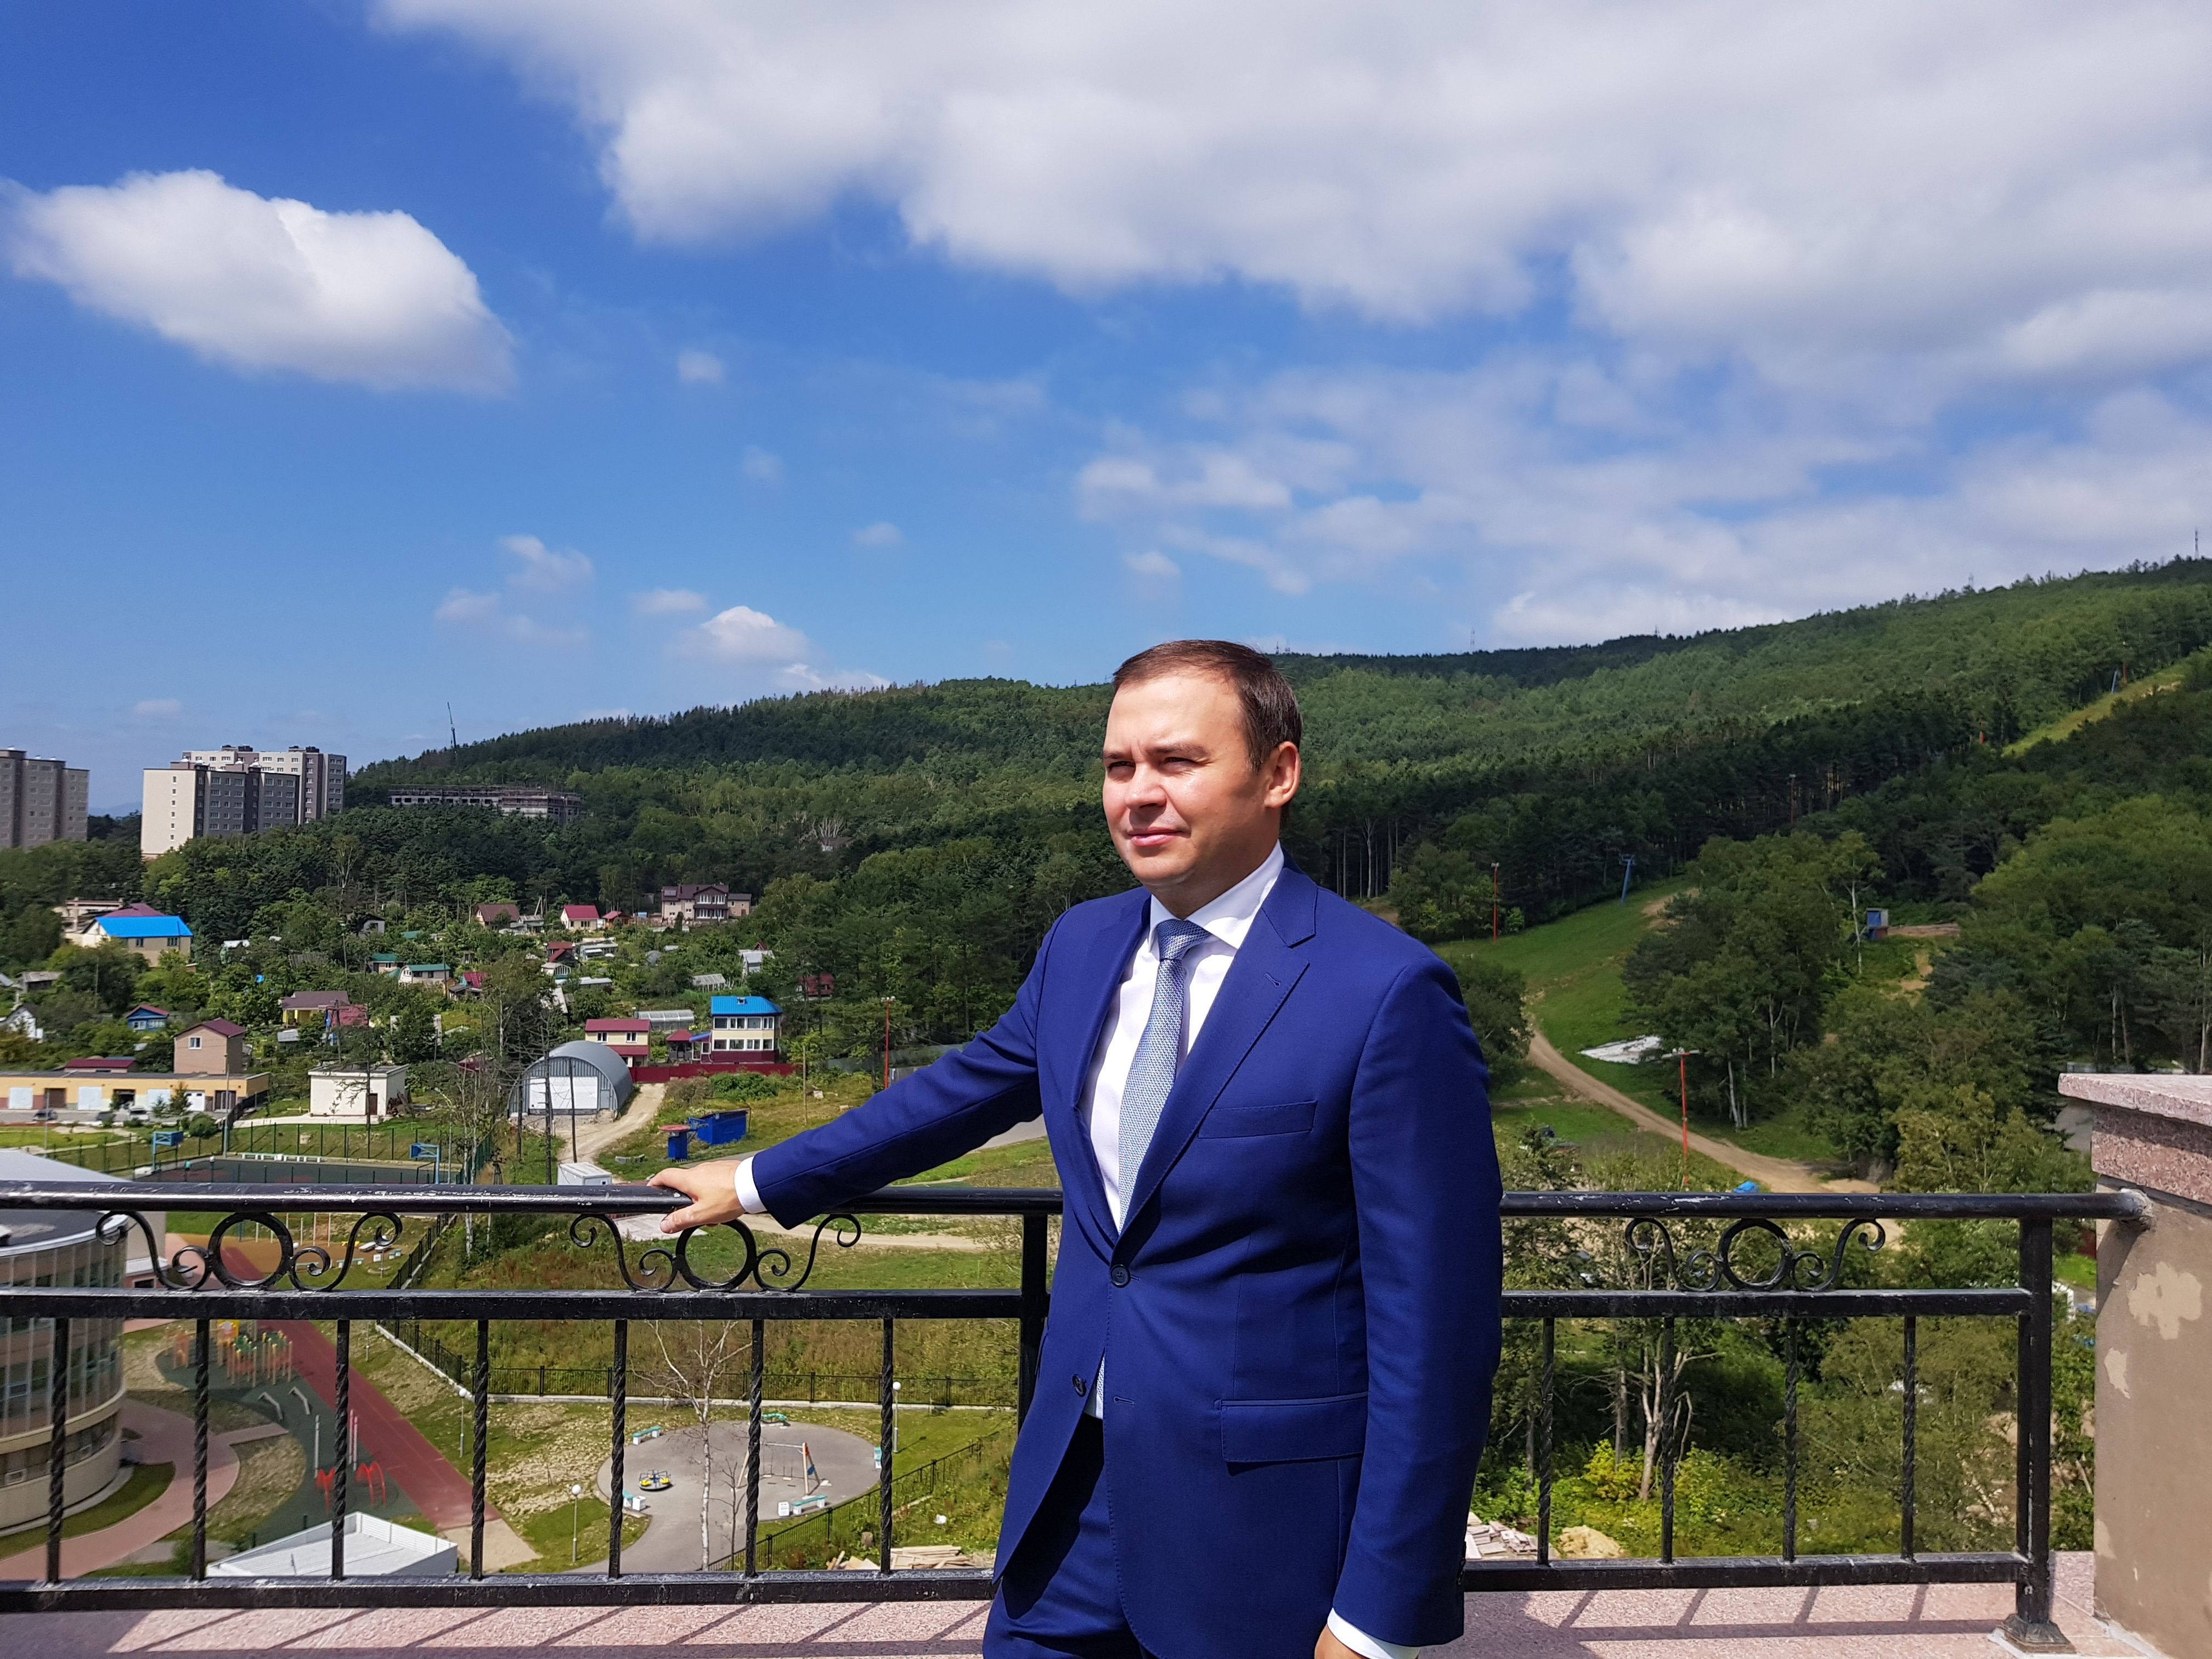 На сахалинской земле...Юрий Афонин - депутат-коммунист